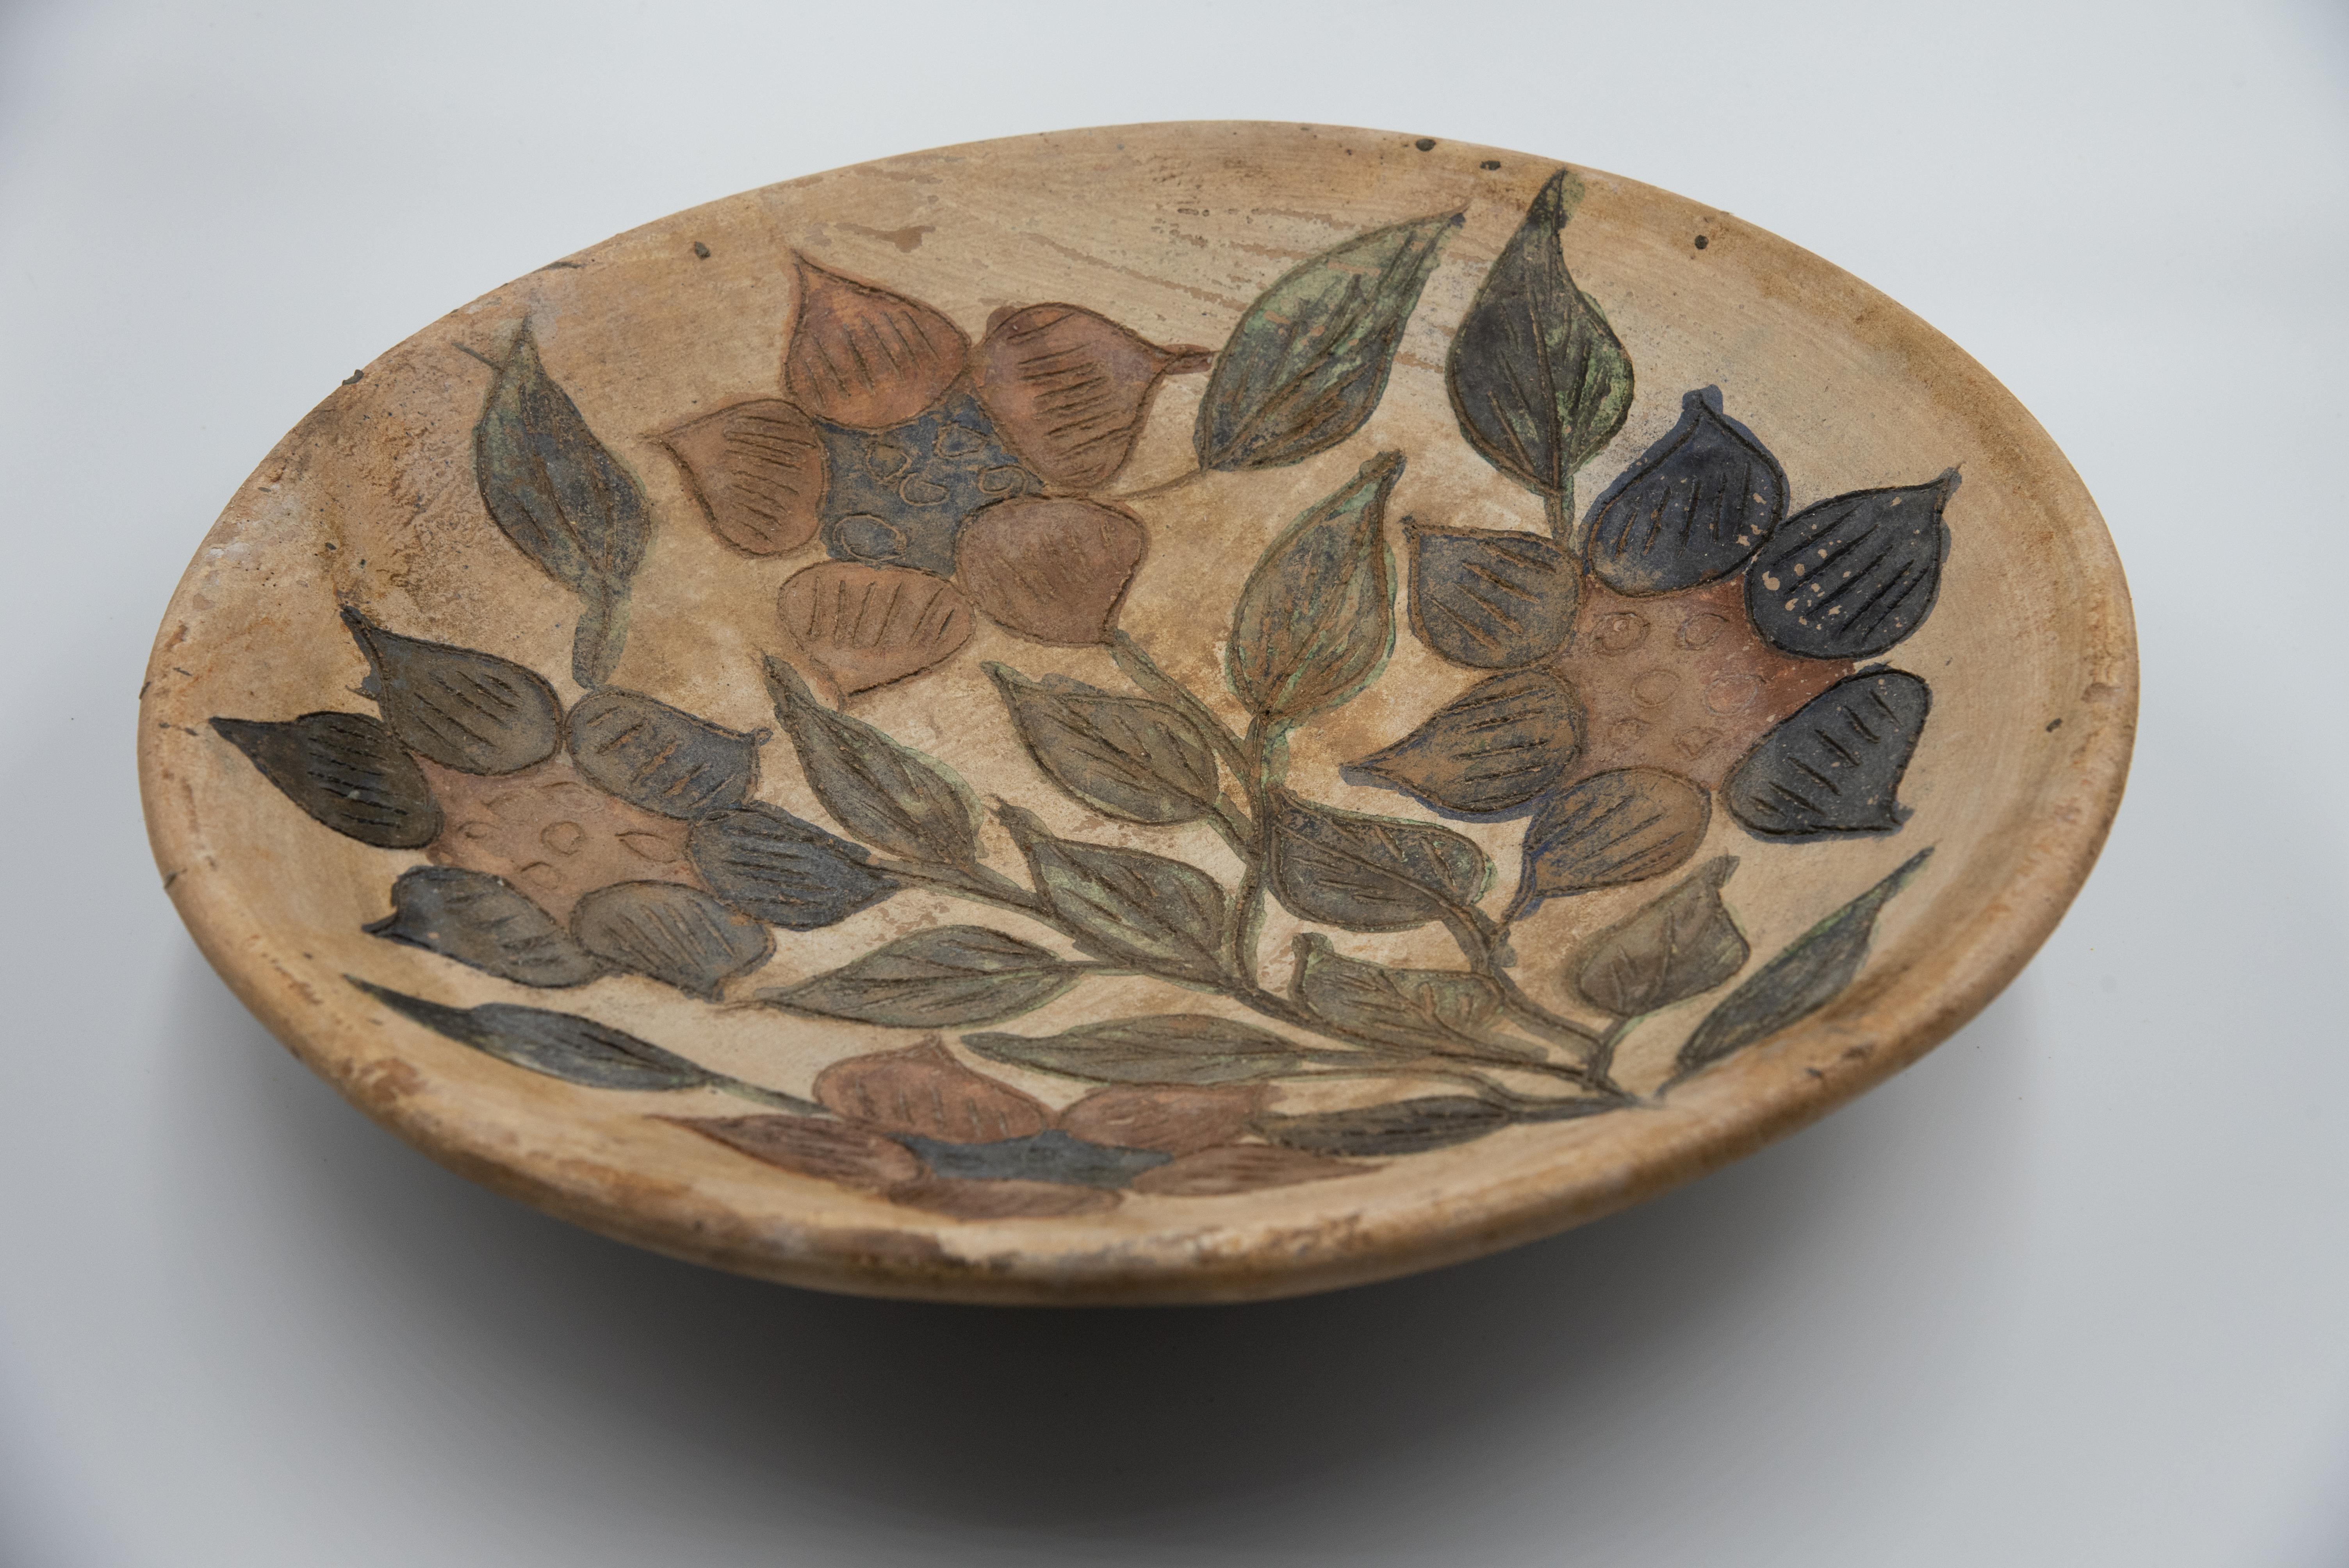 Dolores Porras Pottery Mexican Clay